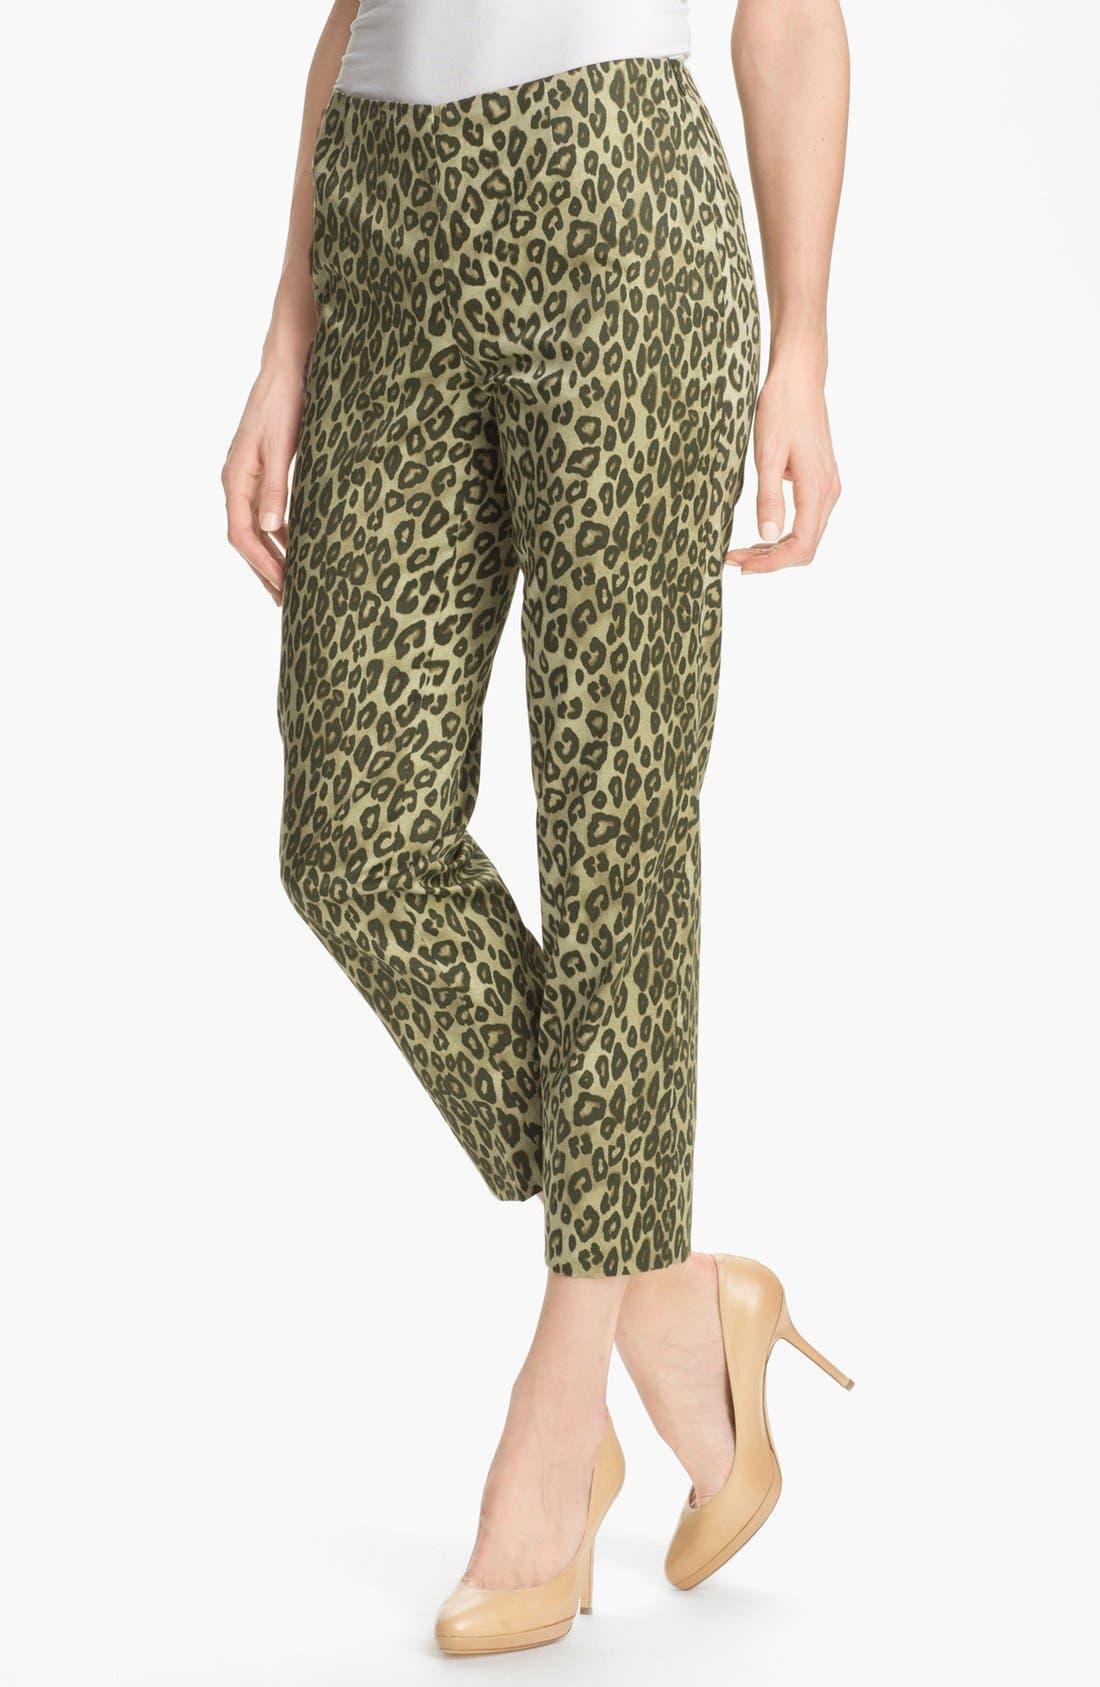 Alternate Image 1 Selected - Lafayette 148 New York 'Bleecker - Senegal Cheetah' Crop Pants